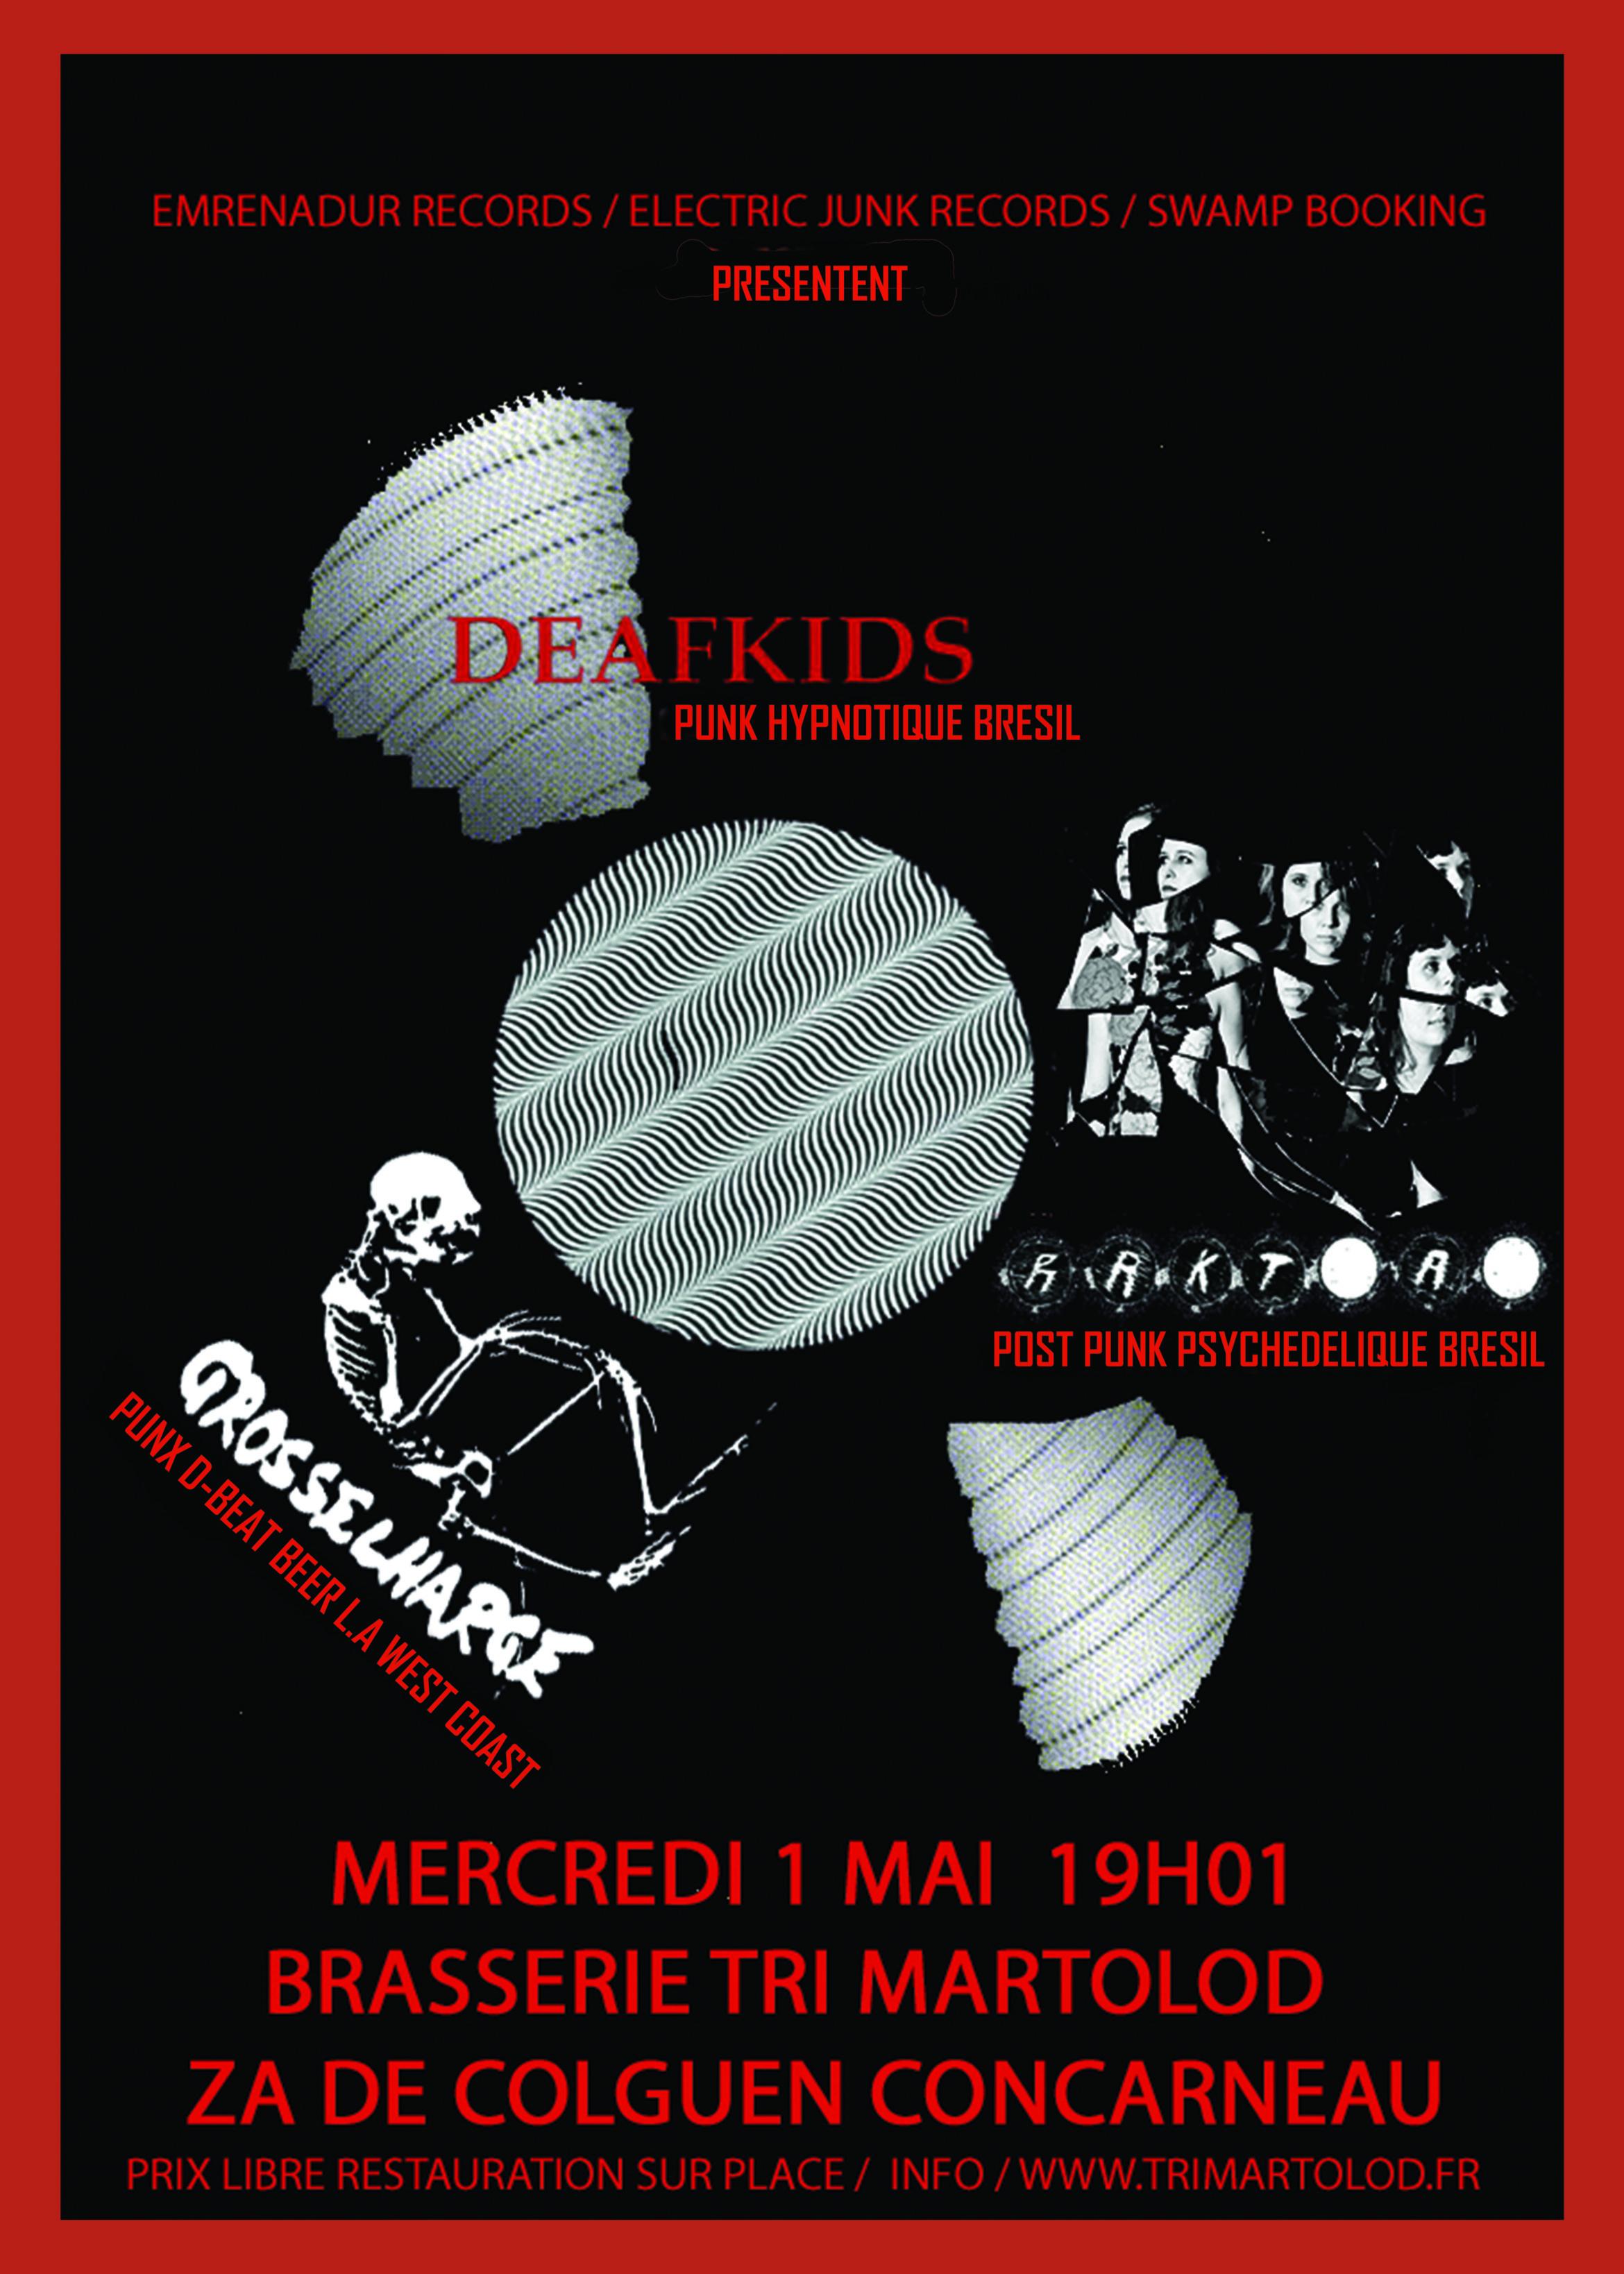 concert-deafkids-rakta.jpg